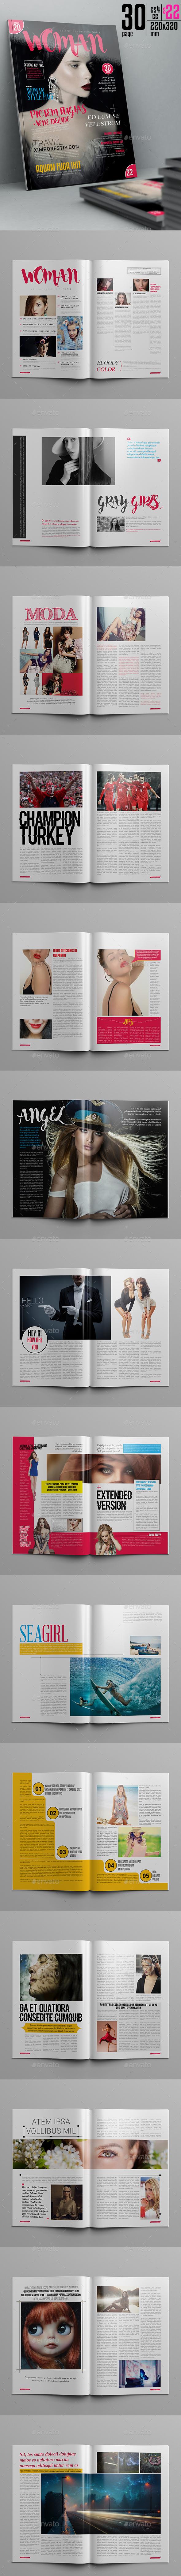 Woman Magazine Template - Magazines Print Templates